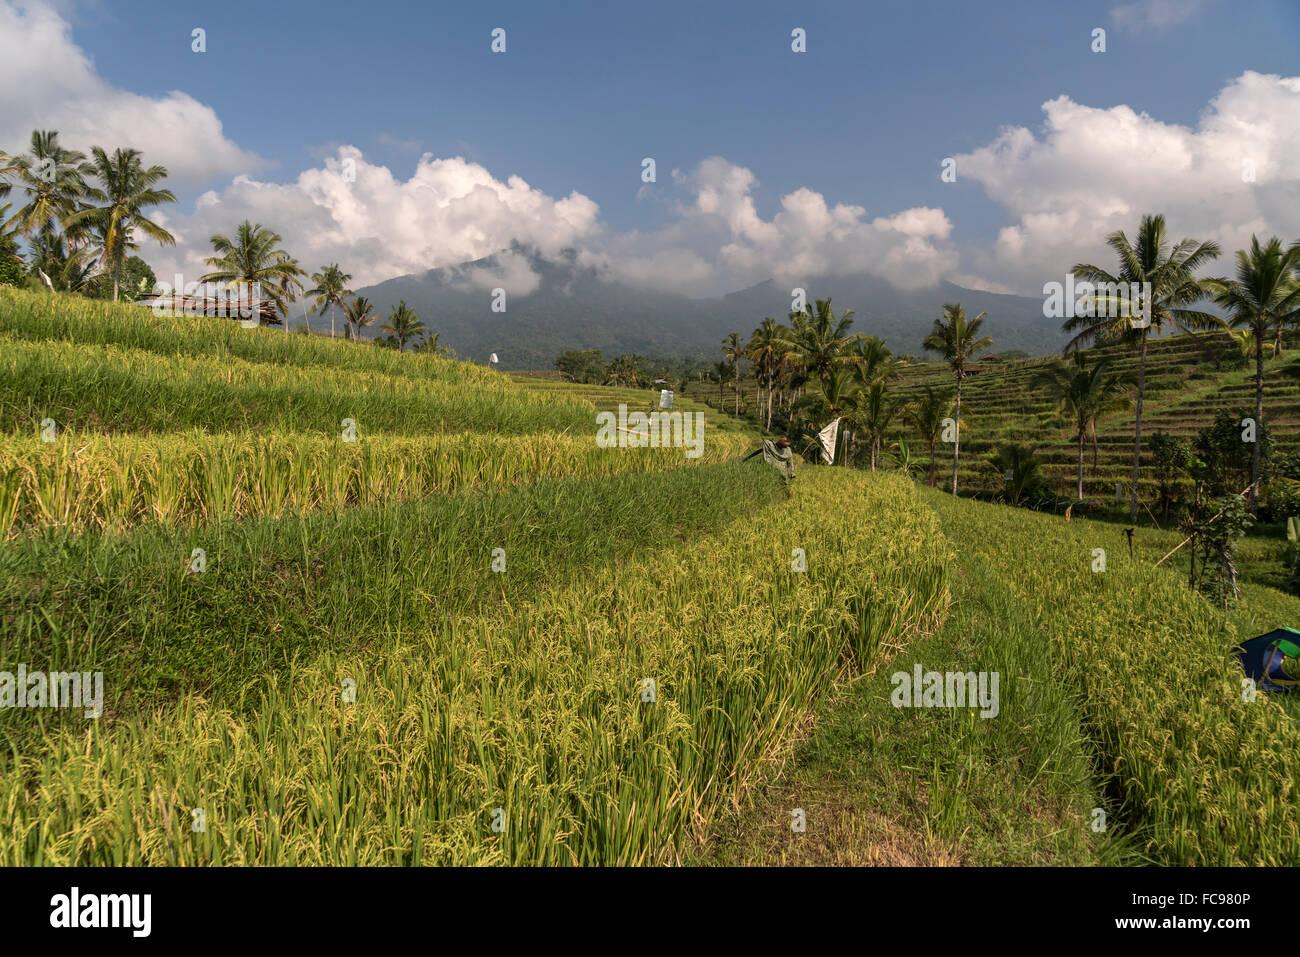 the Jatiluwih Rice Terraces, UNESCO world heritage on Bali, Indonesia - Stock Image